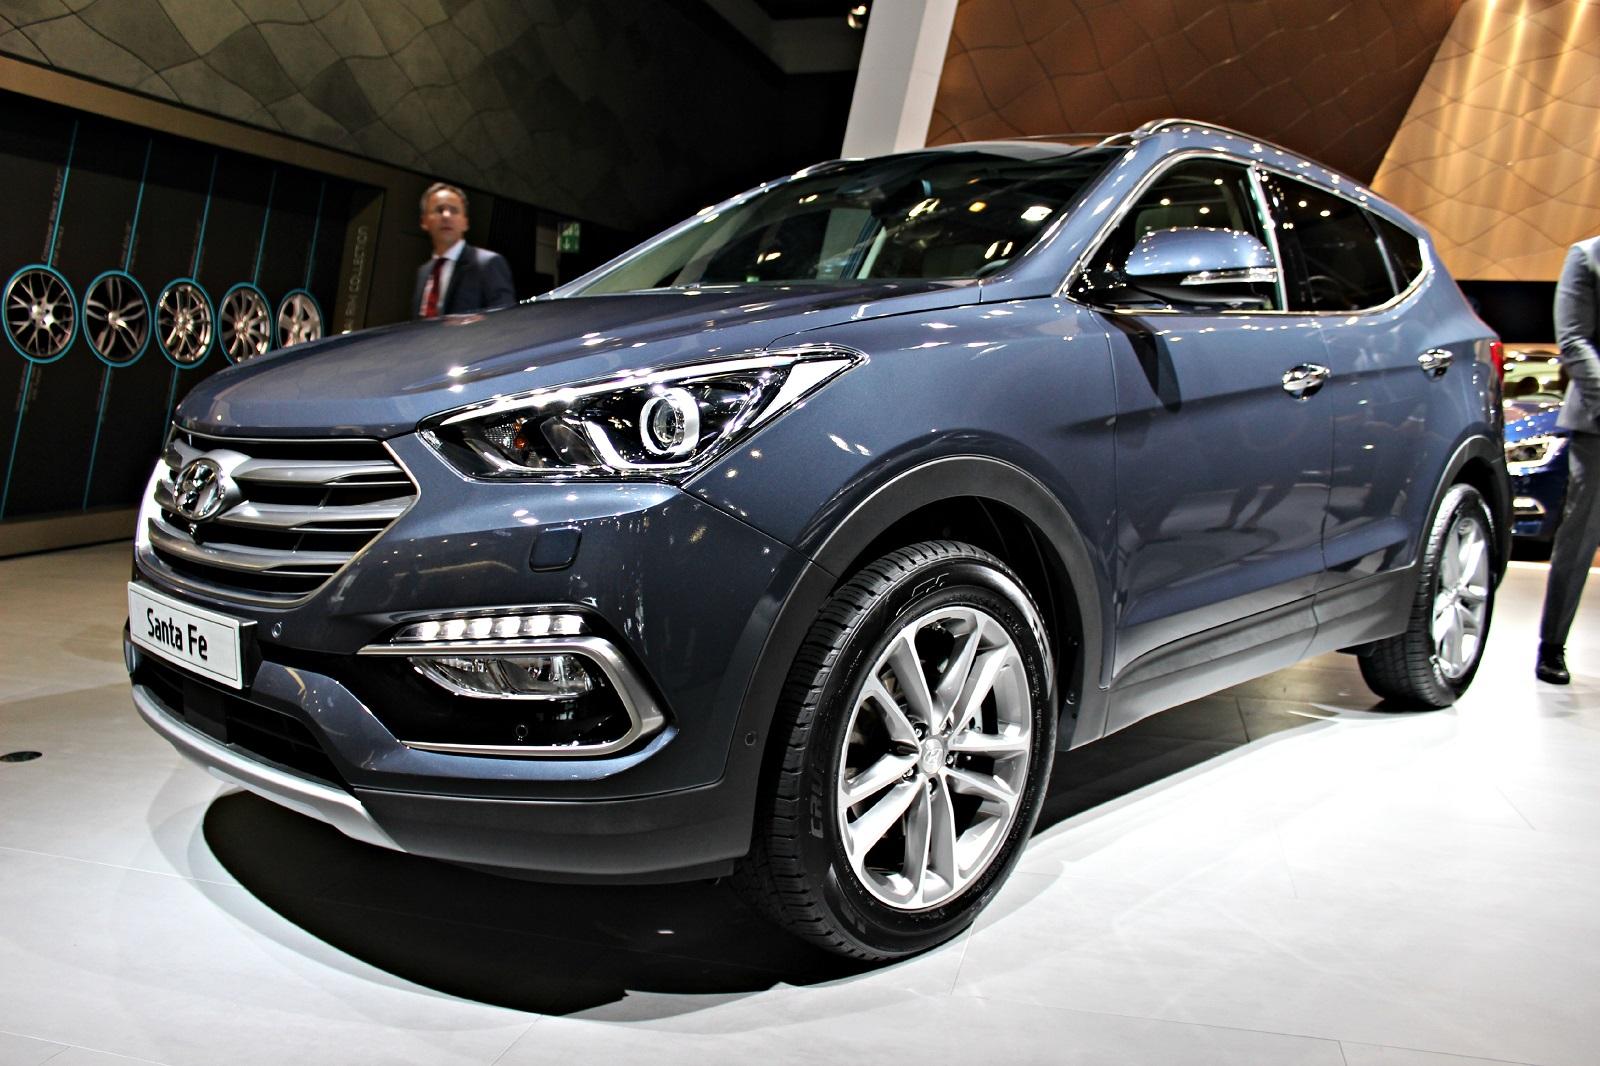 Hyundai santa fe restyl l ger repoudrage vid o en for Prix entree salon du bourget 2015